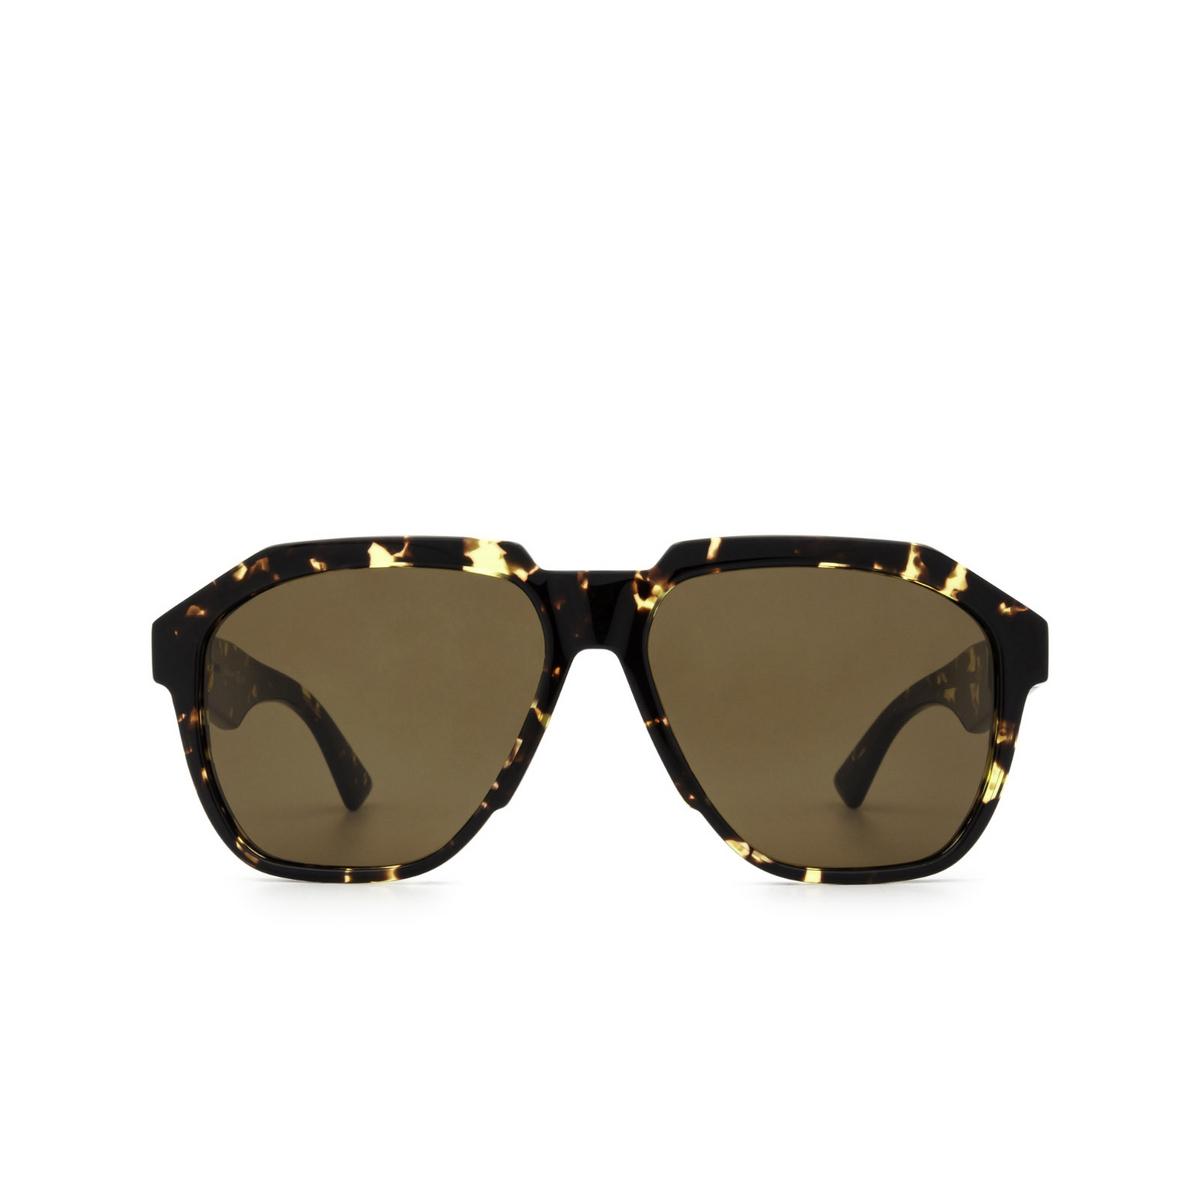 Bottega Veneta® Aviator Sunglasses: BV1034S color Havana 002 - front view.